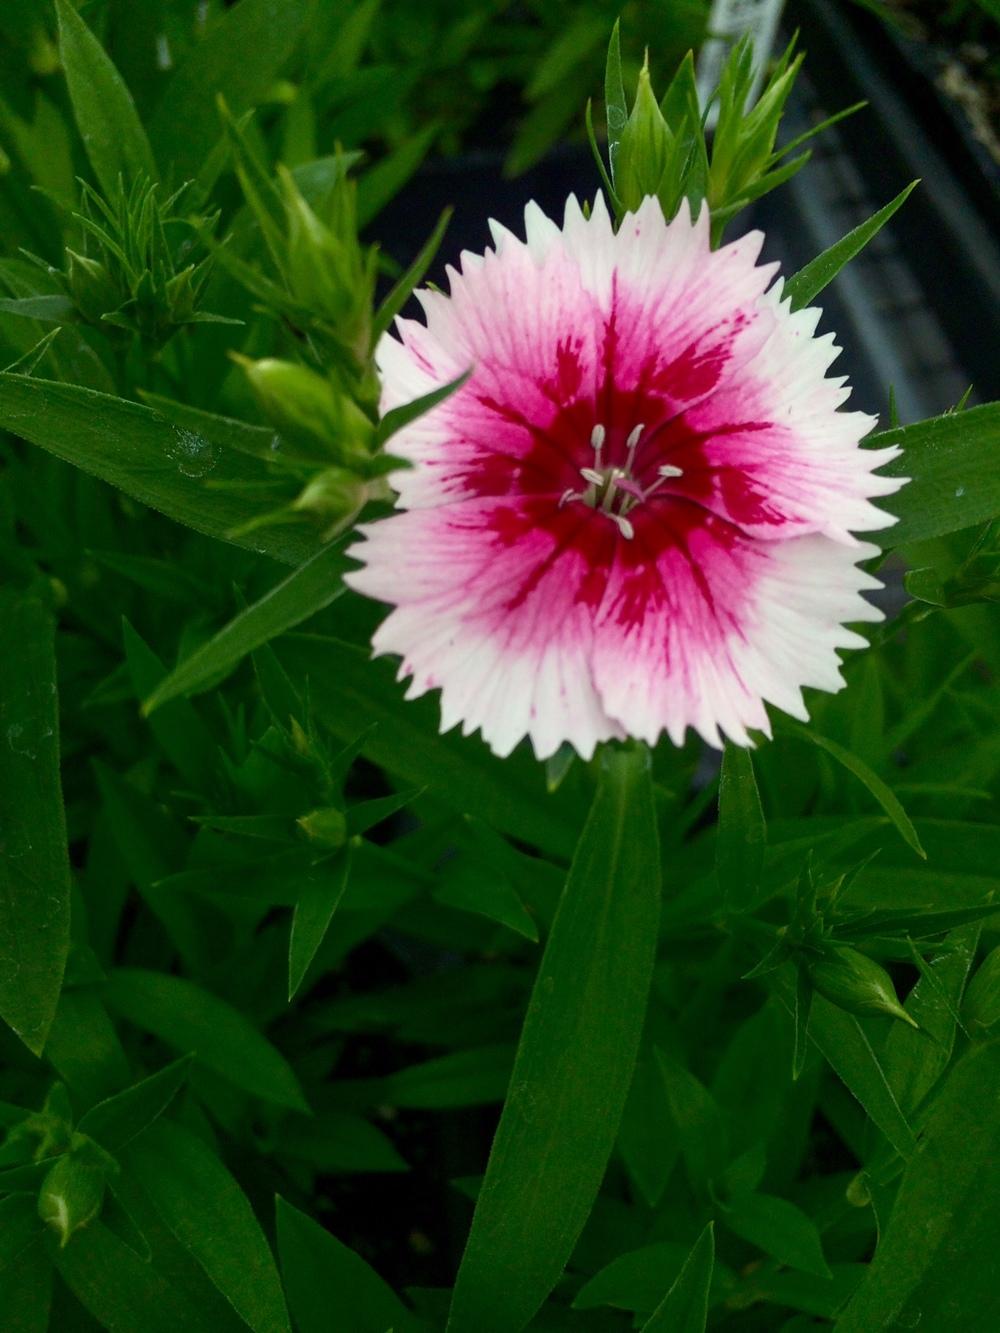 Blog edwards greenhouse bright daisy like flowers full sun 24 tall izmirmasajfo Choice Image